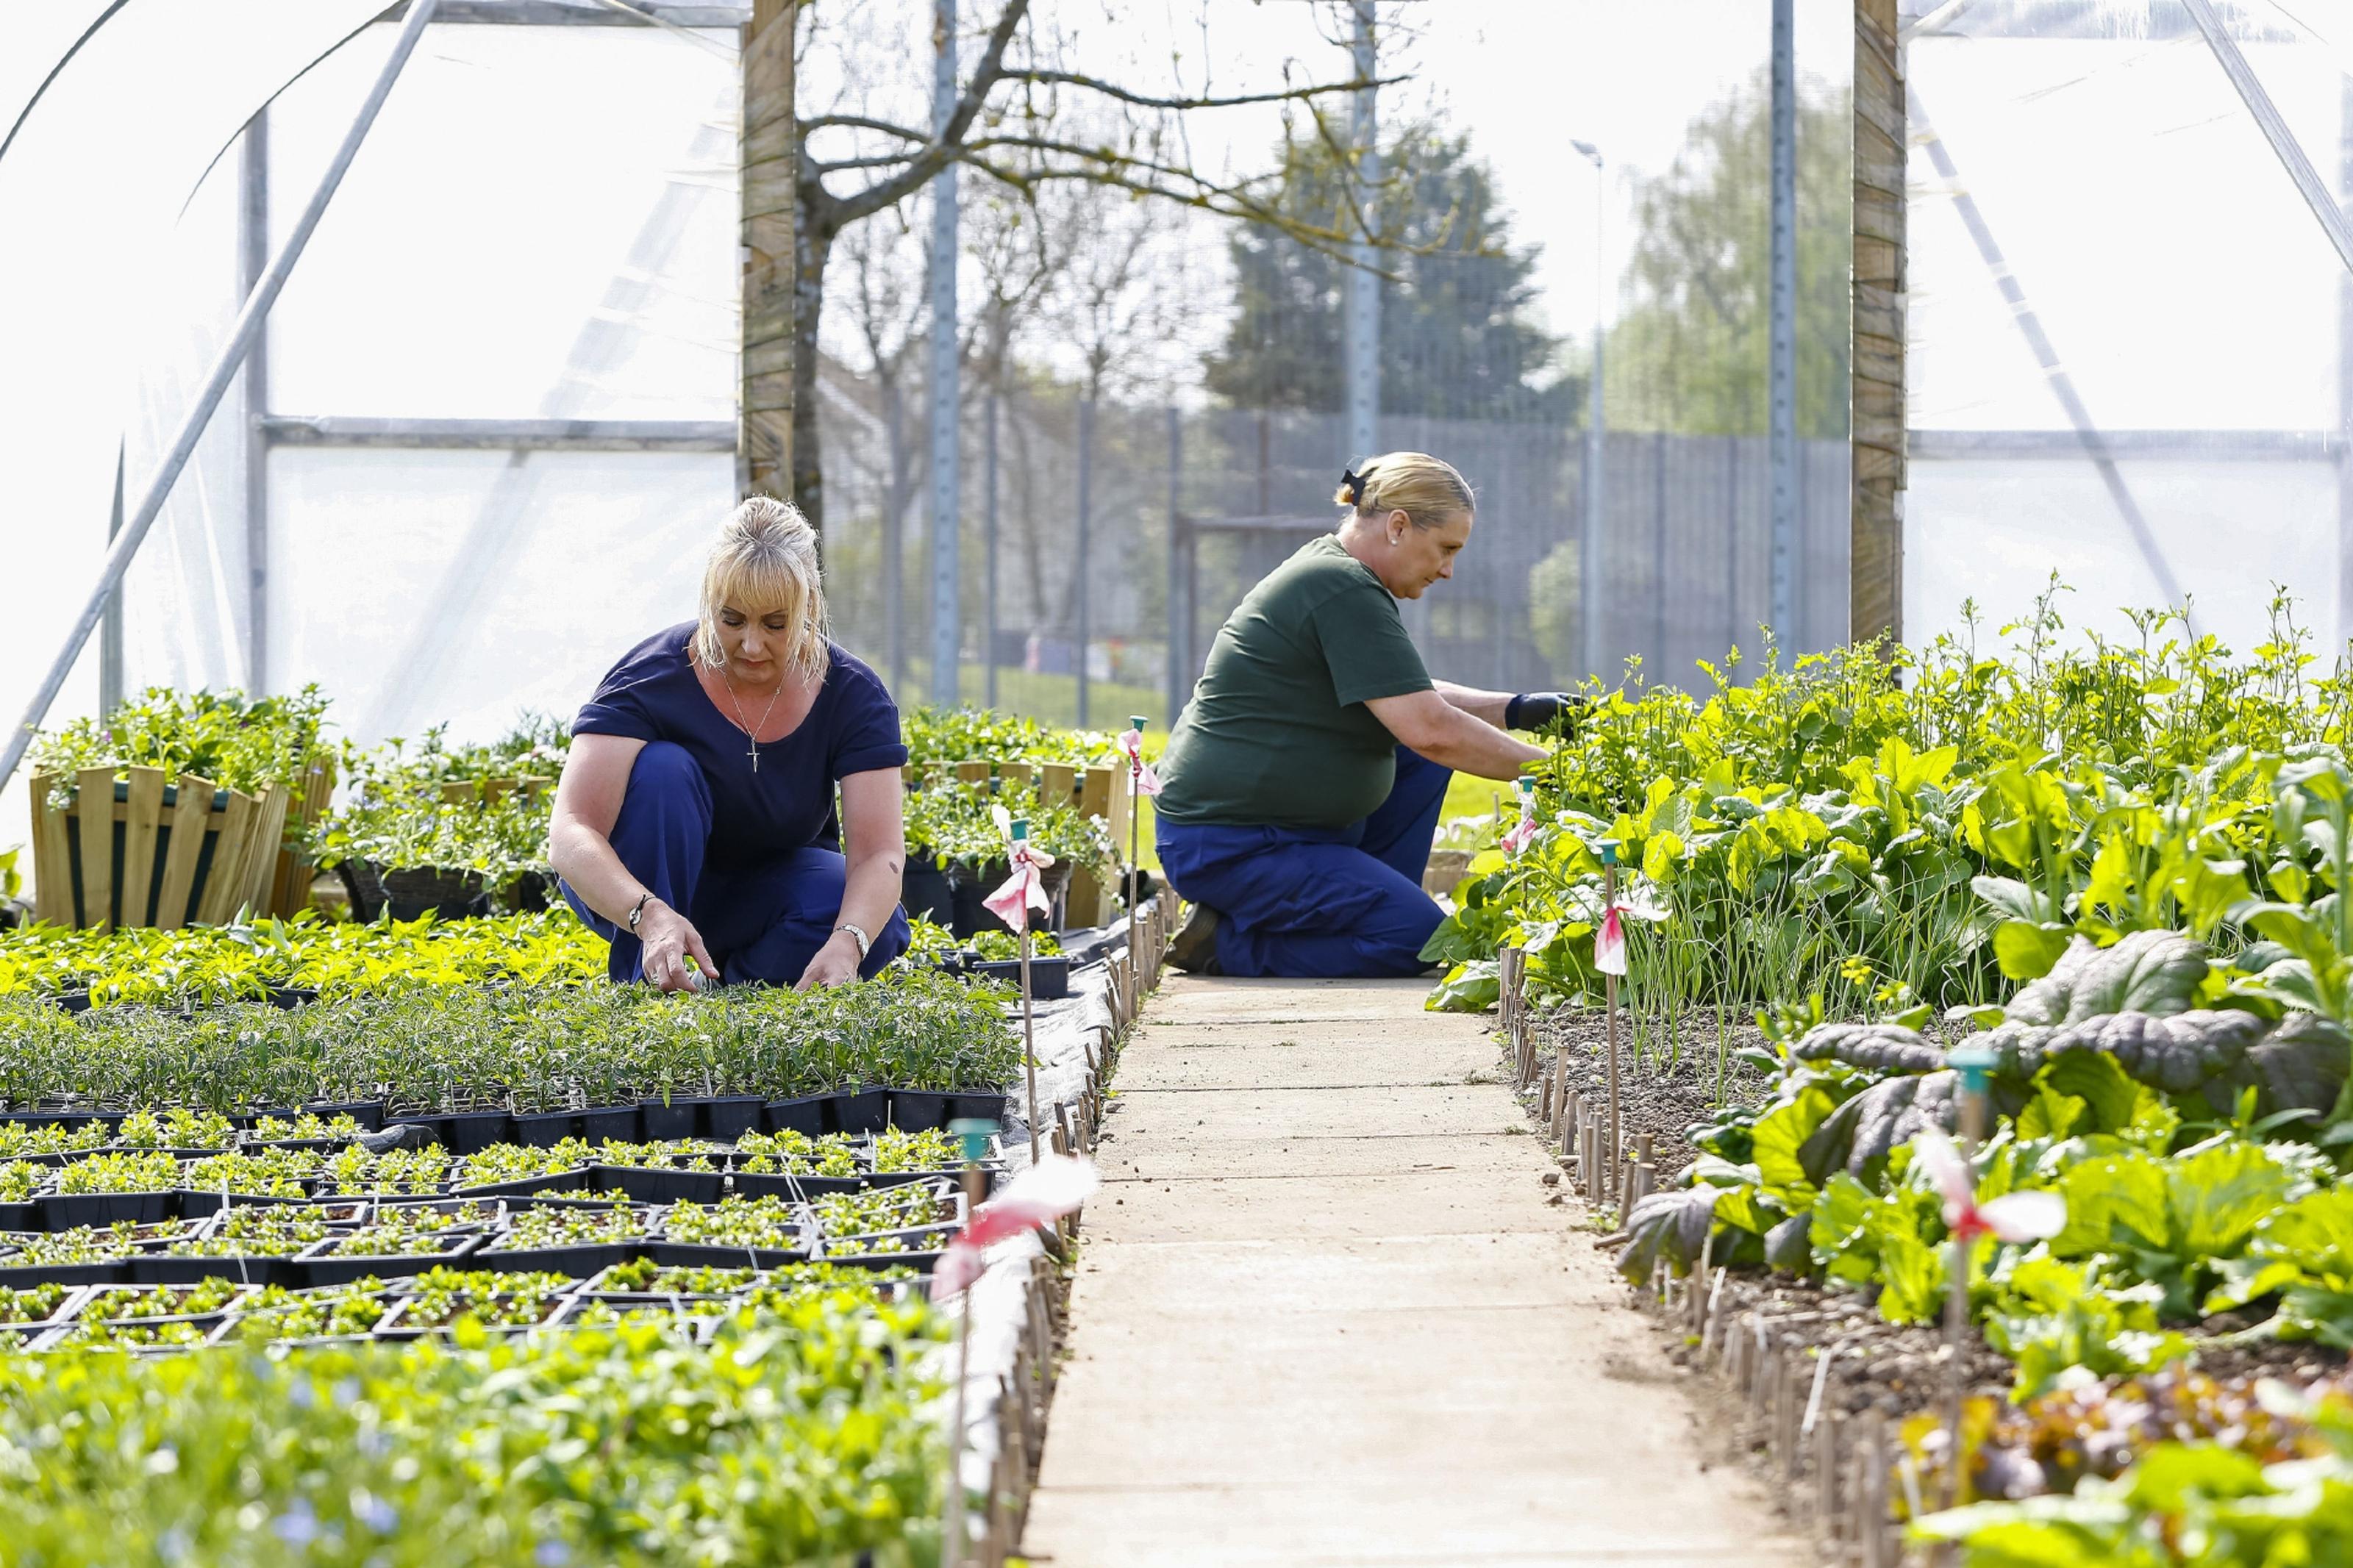 Gardening Scotland To Feature Prison Show Garden The Courier